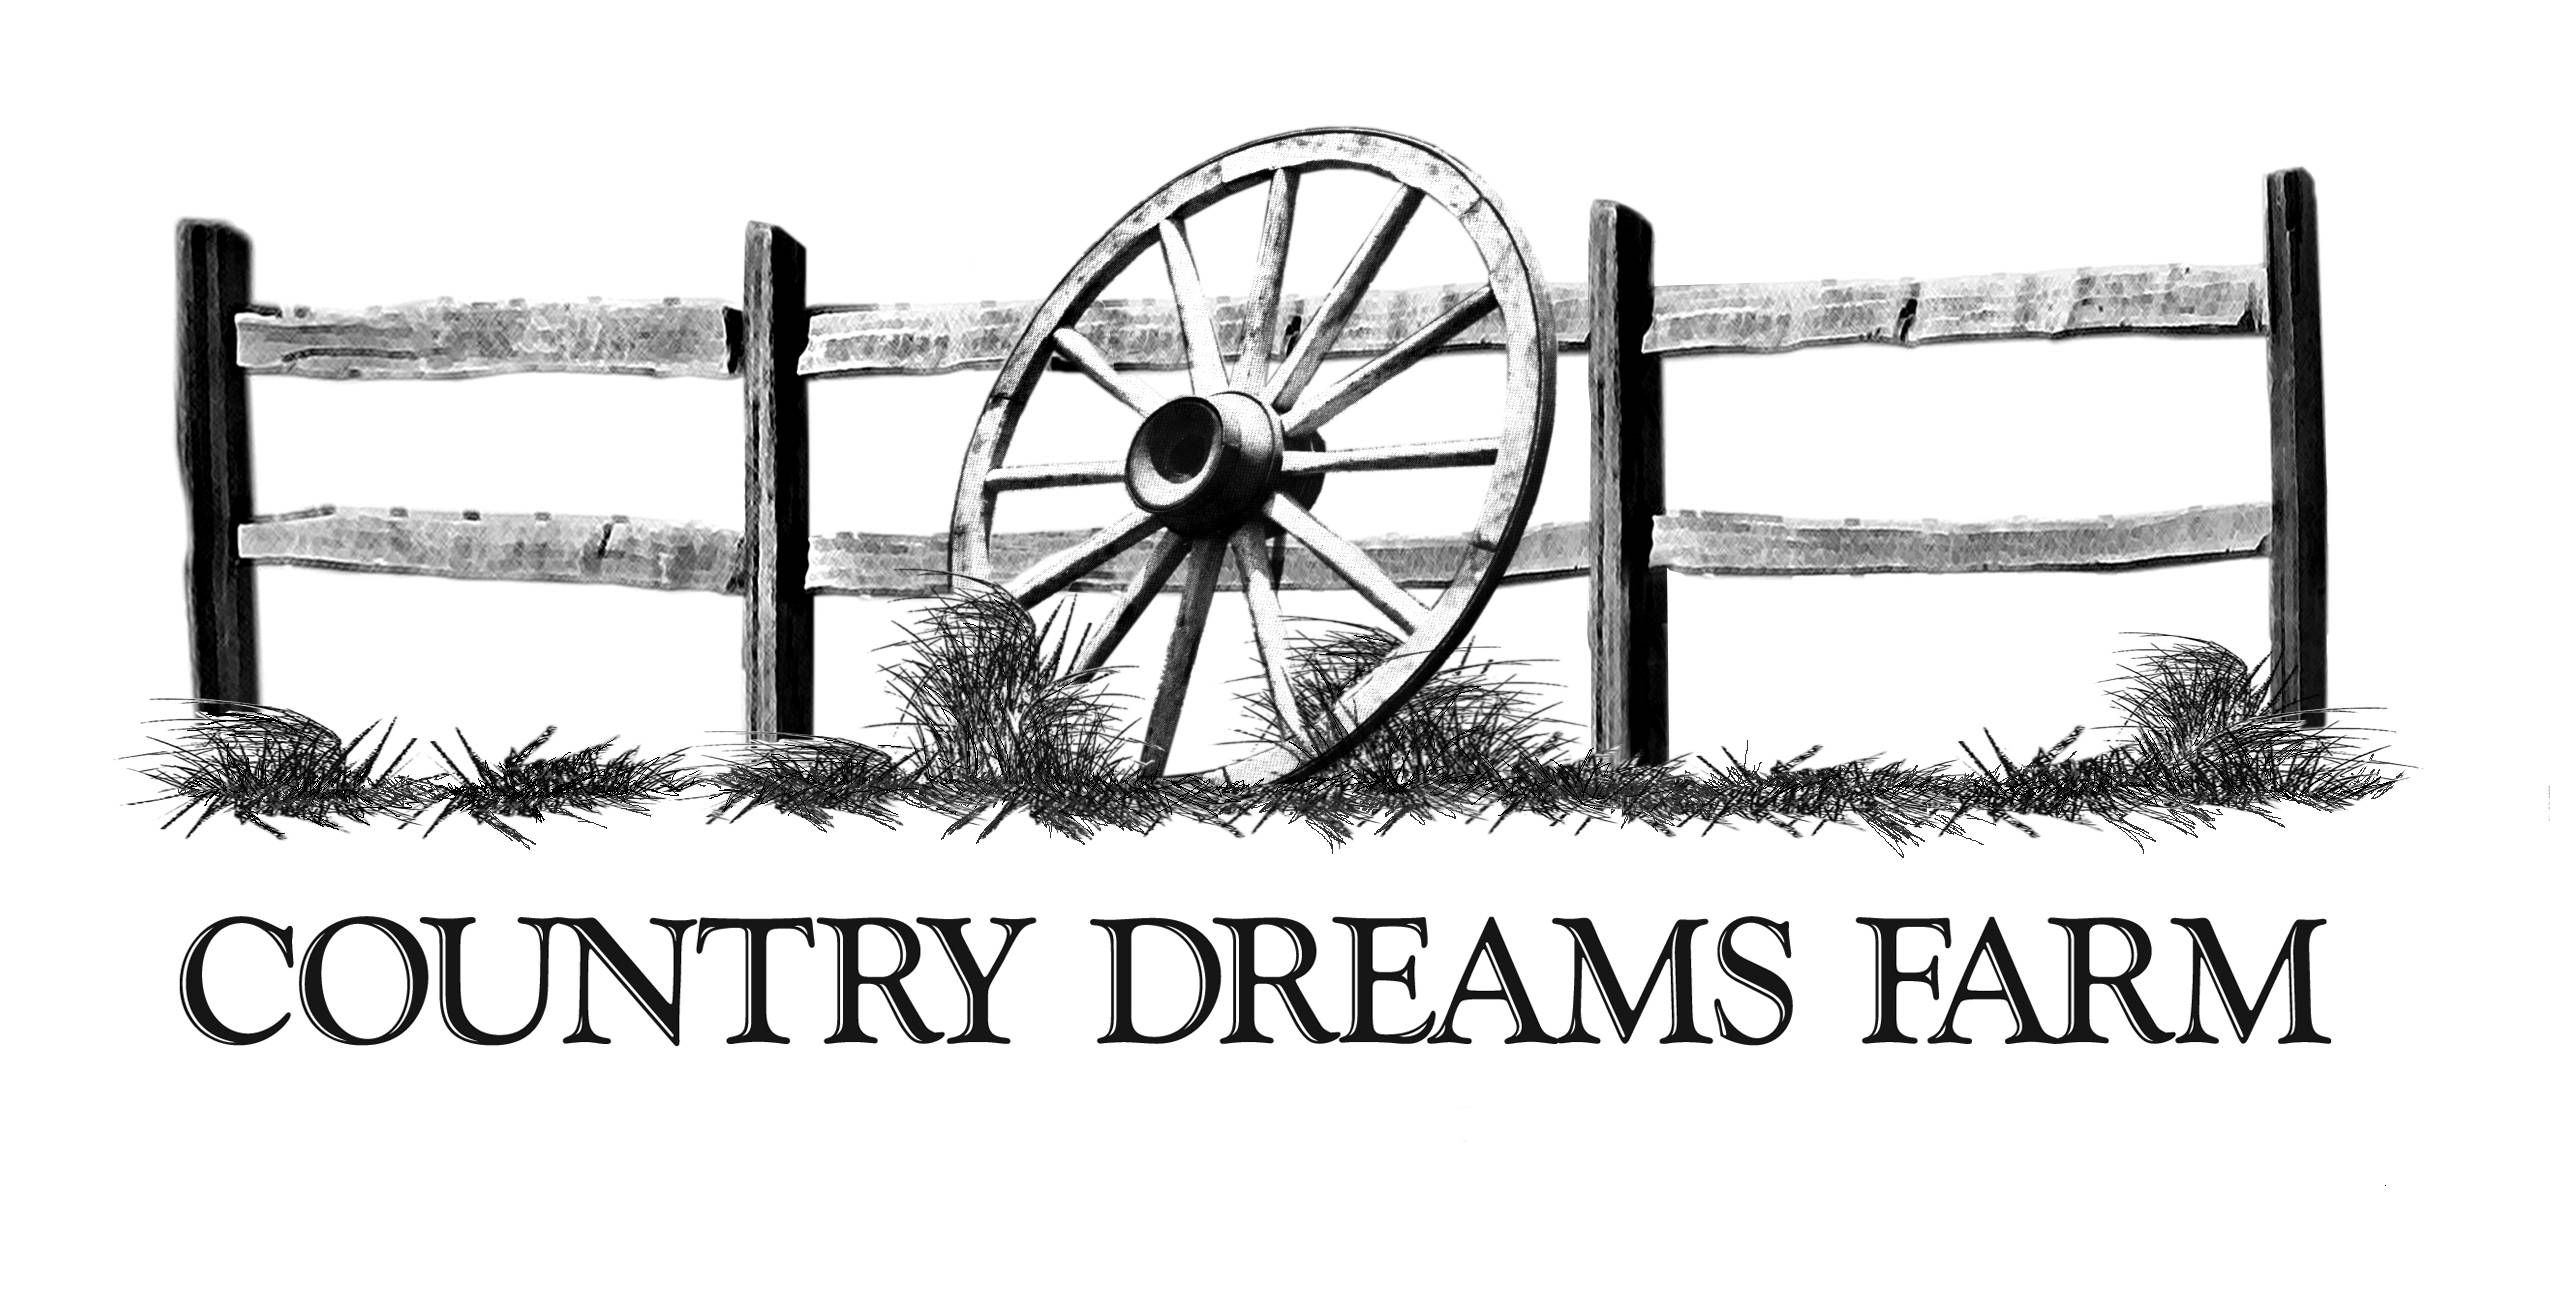 Country Dreams Farm Logo By Gail Olsheski